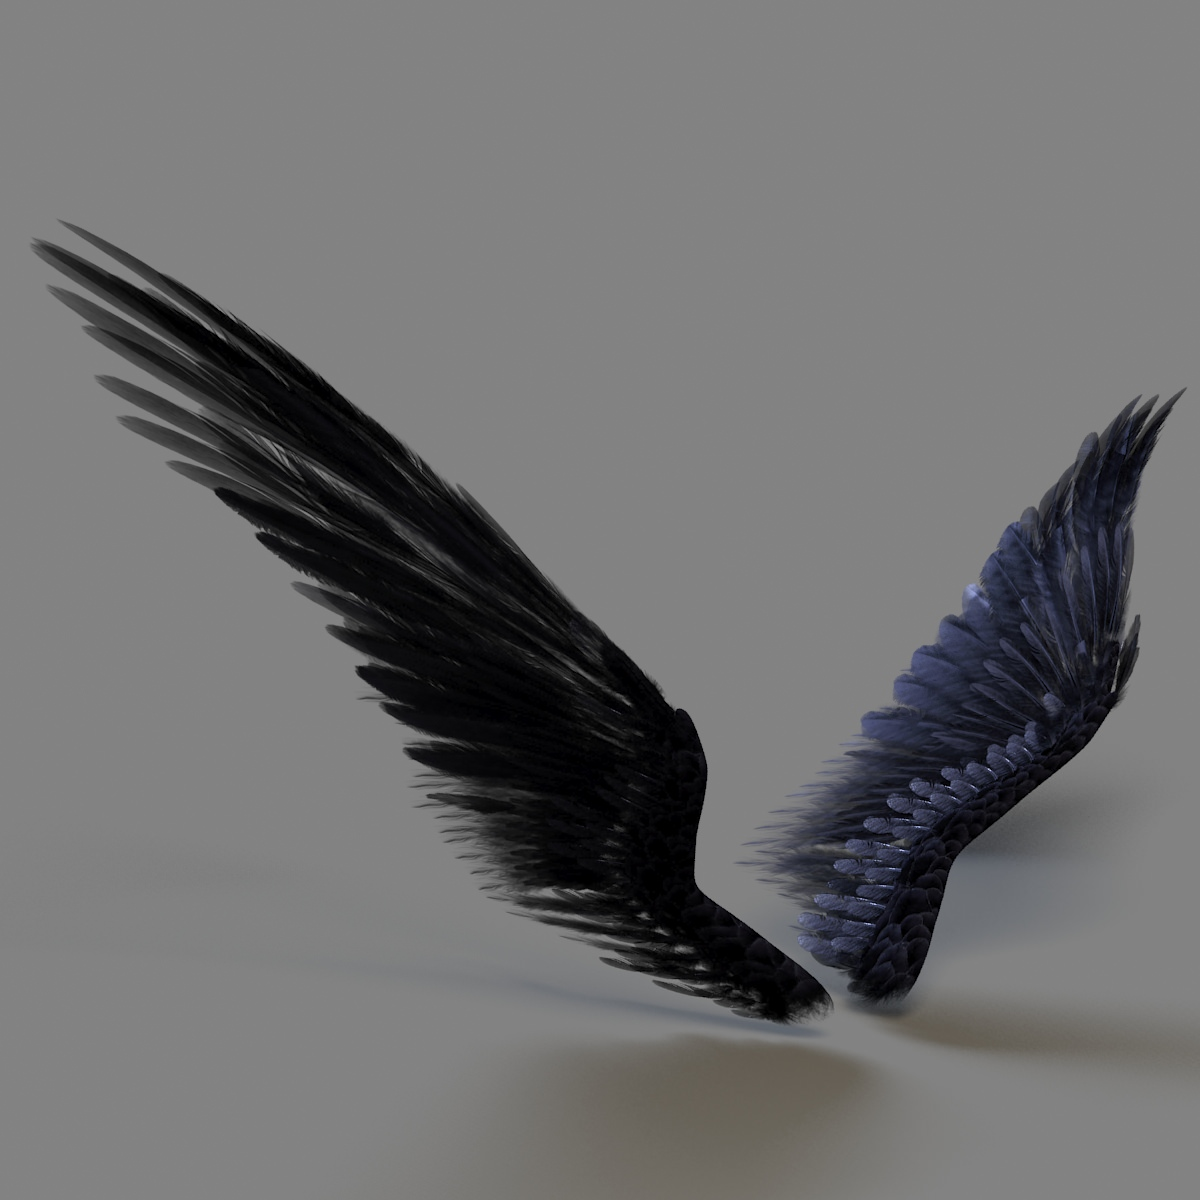 wings 3D Models - CGTrader.com